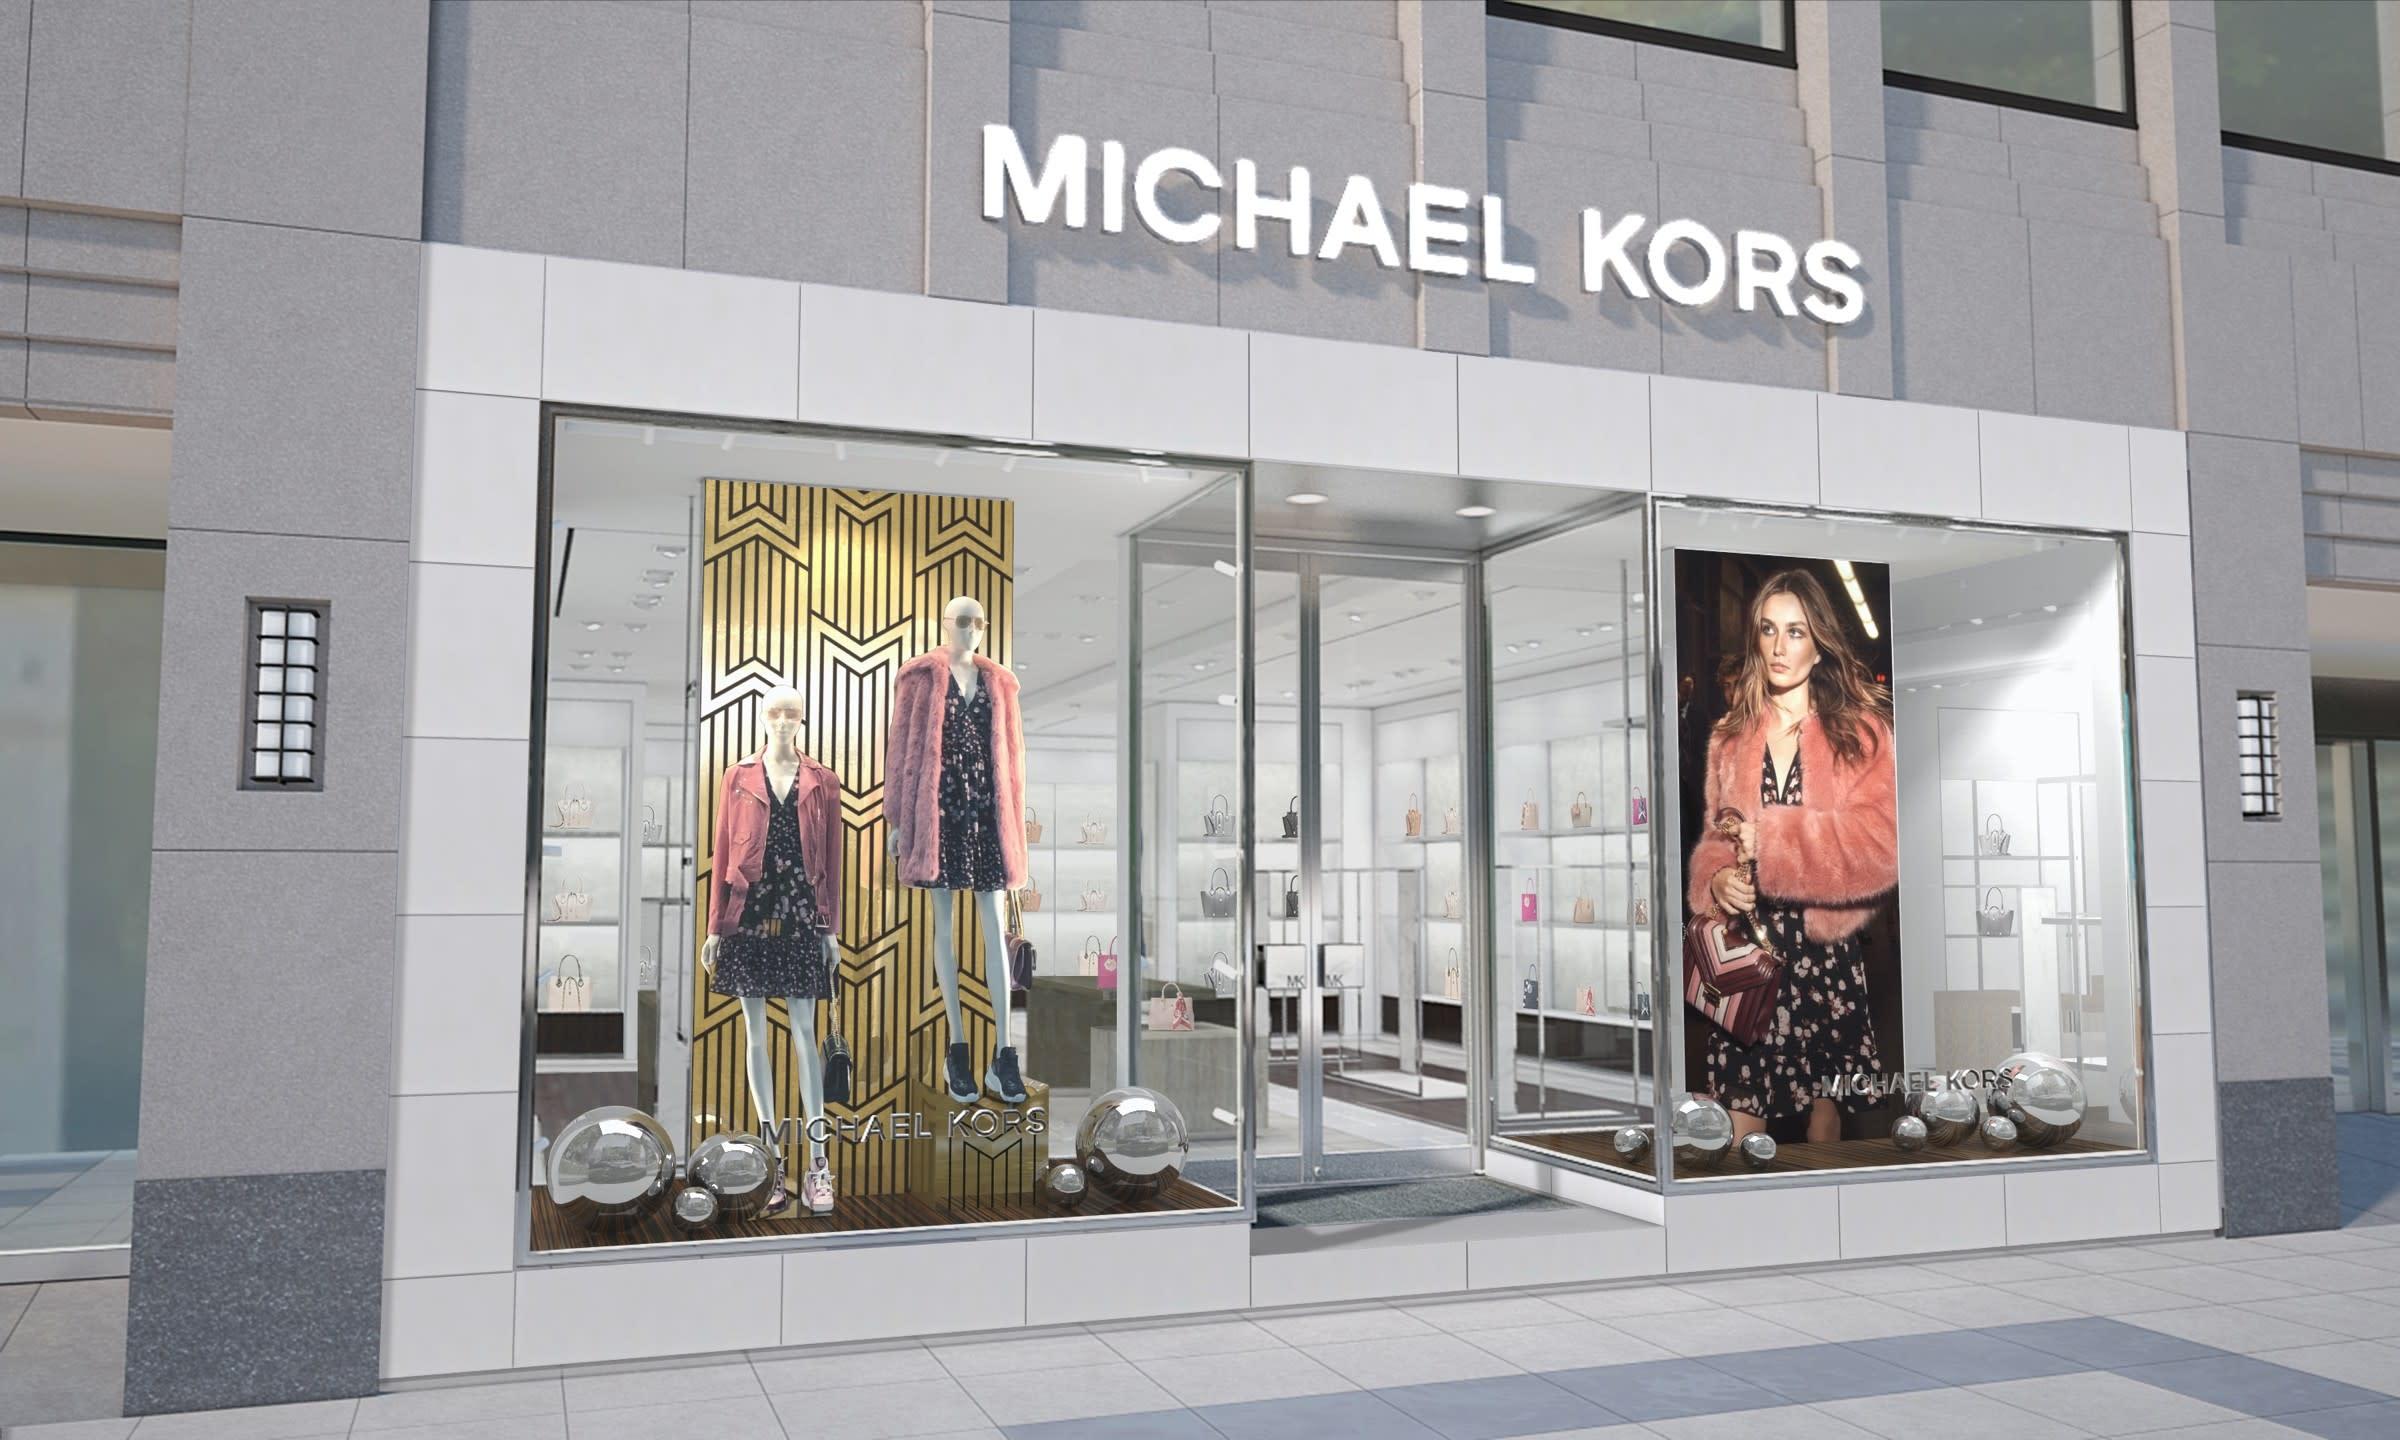 054c3bf39c73 「マイケル・コース(MICHAEL KORS)」が、大阪御堂筋に路面店「マイケル・コース心斎橋」を12月24日にオープンする。